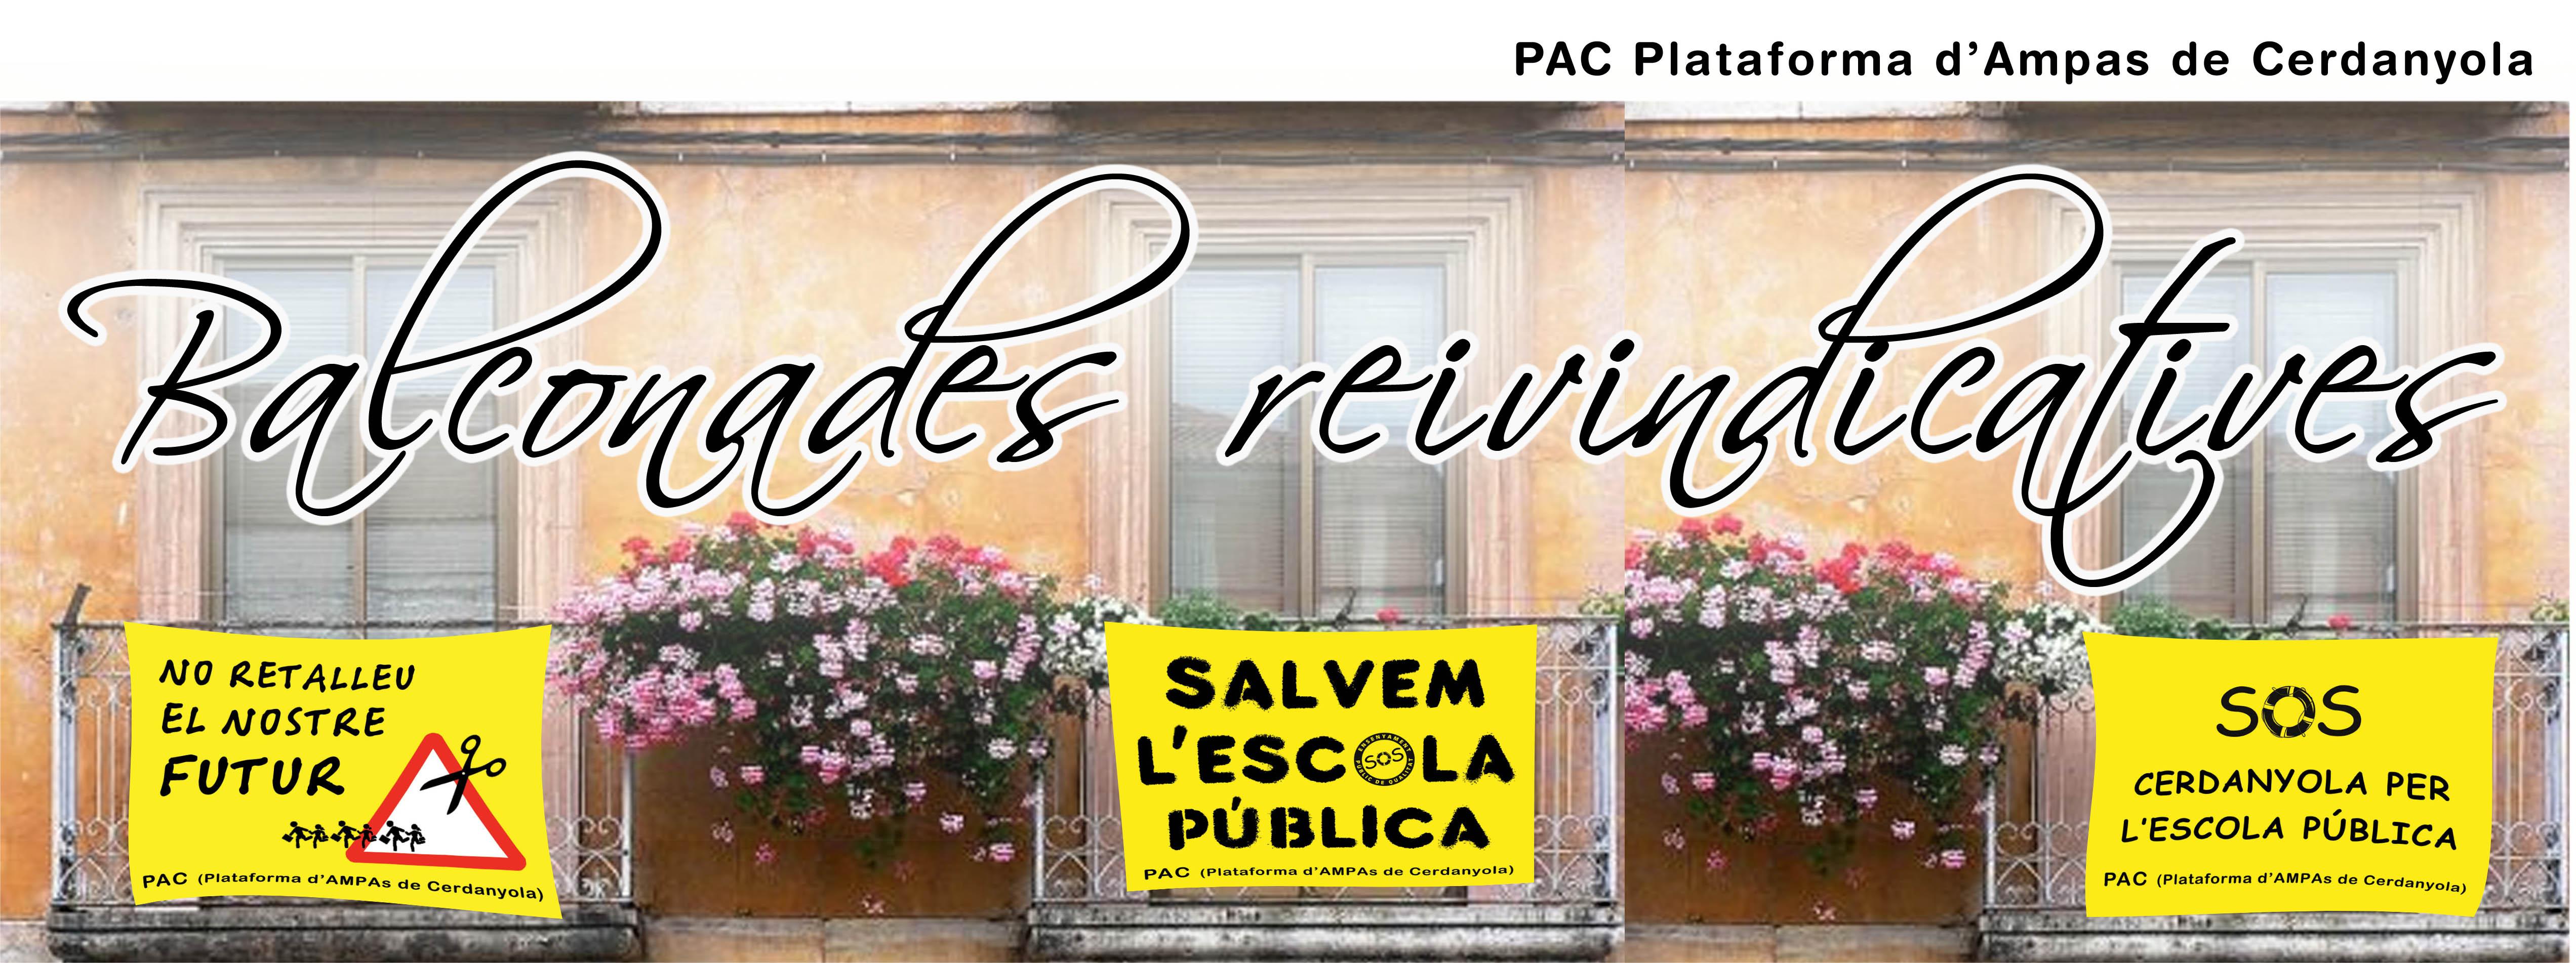 balconades-cerdanyola-del-vallc3a8s